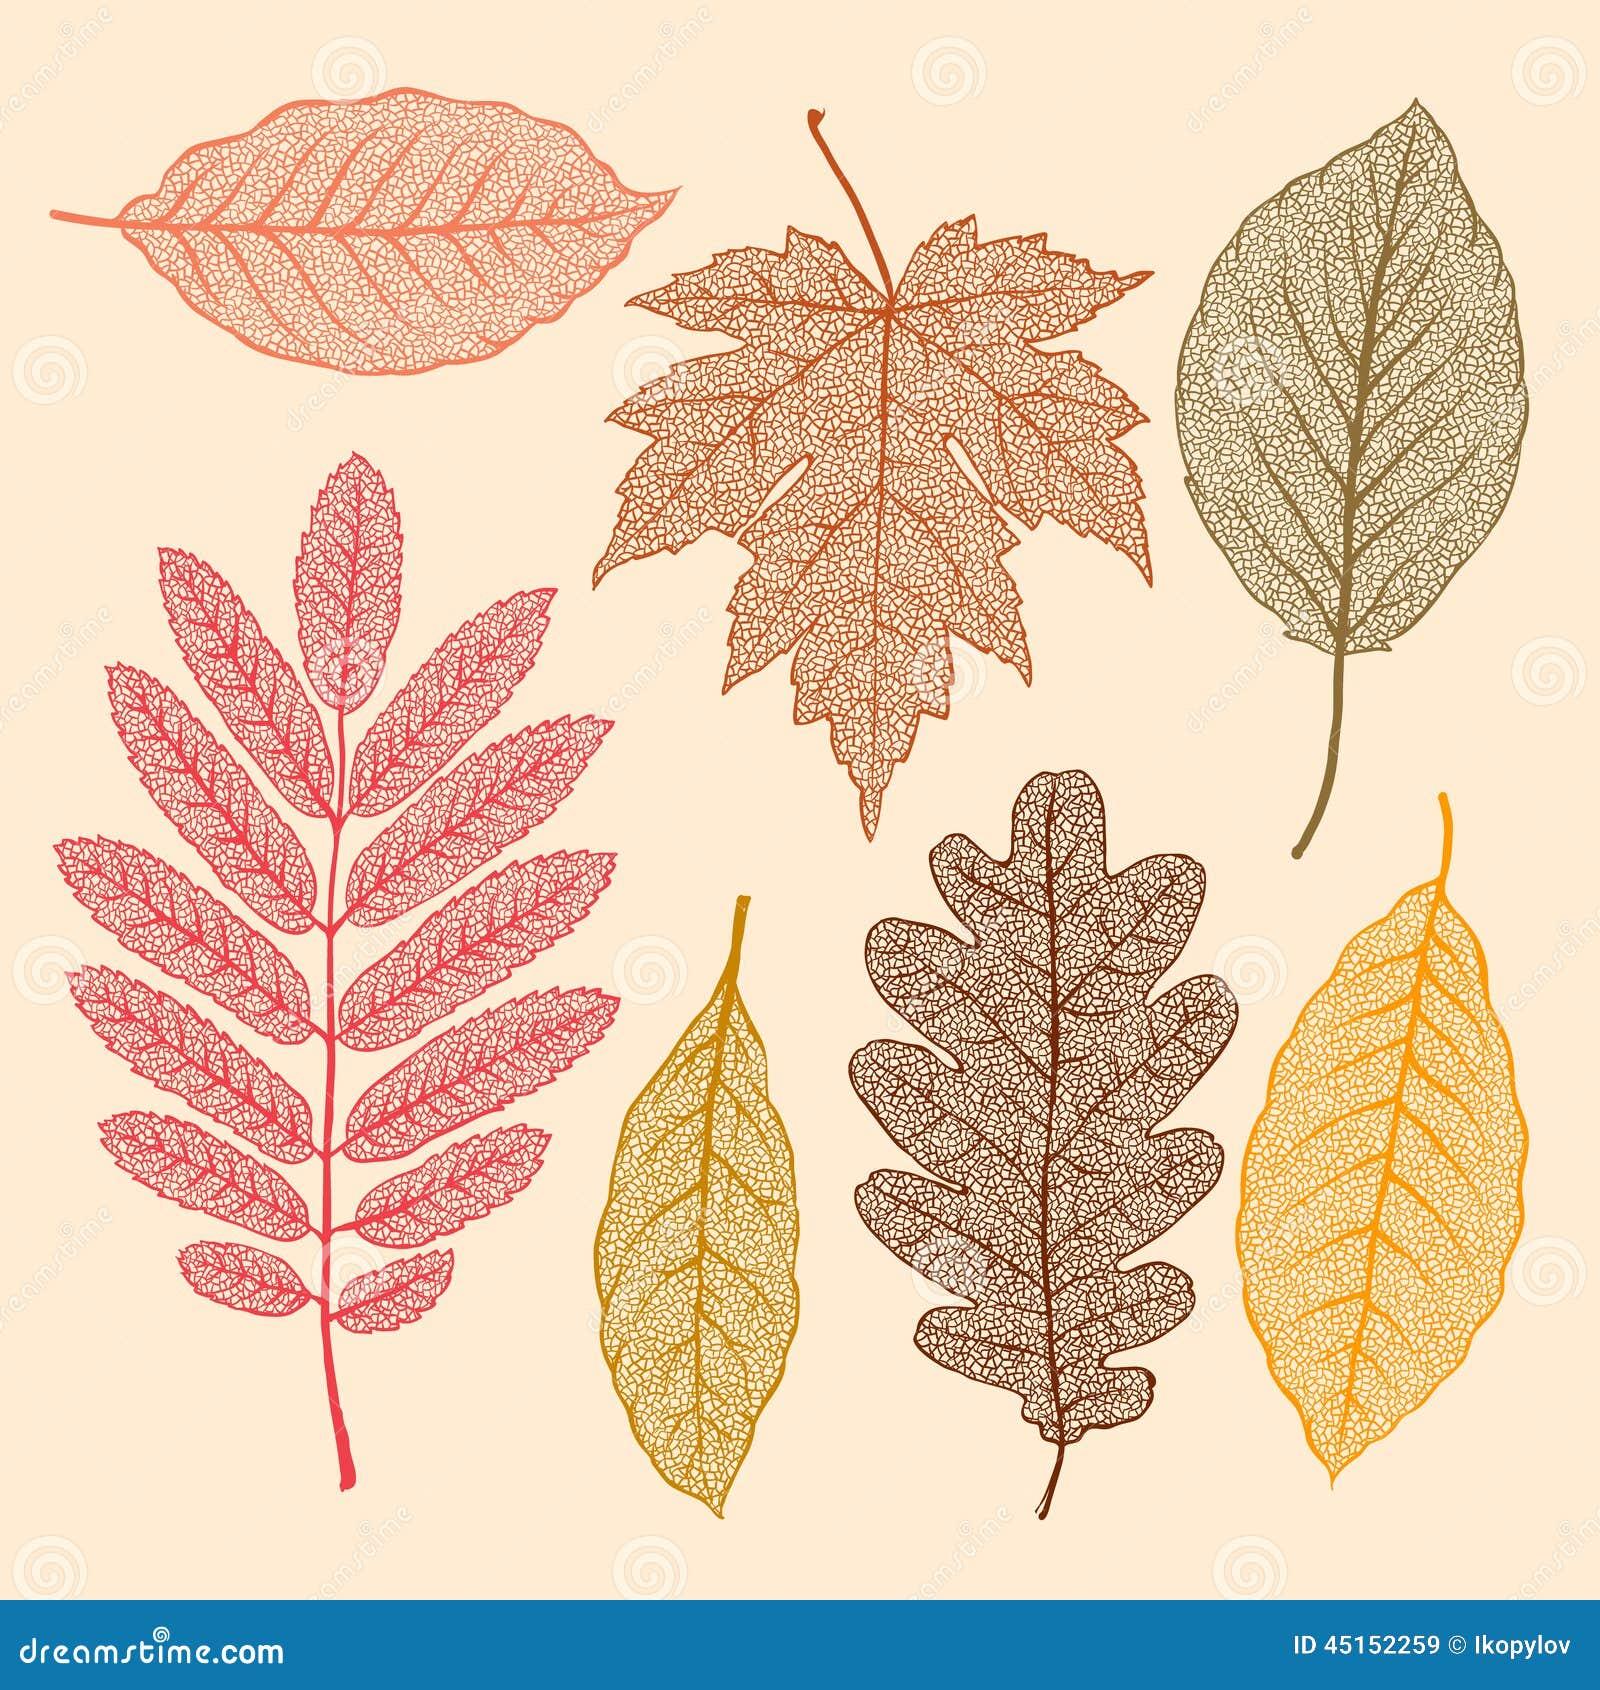 Autumn leaves, dried leaves set